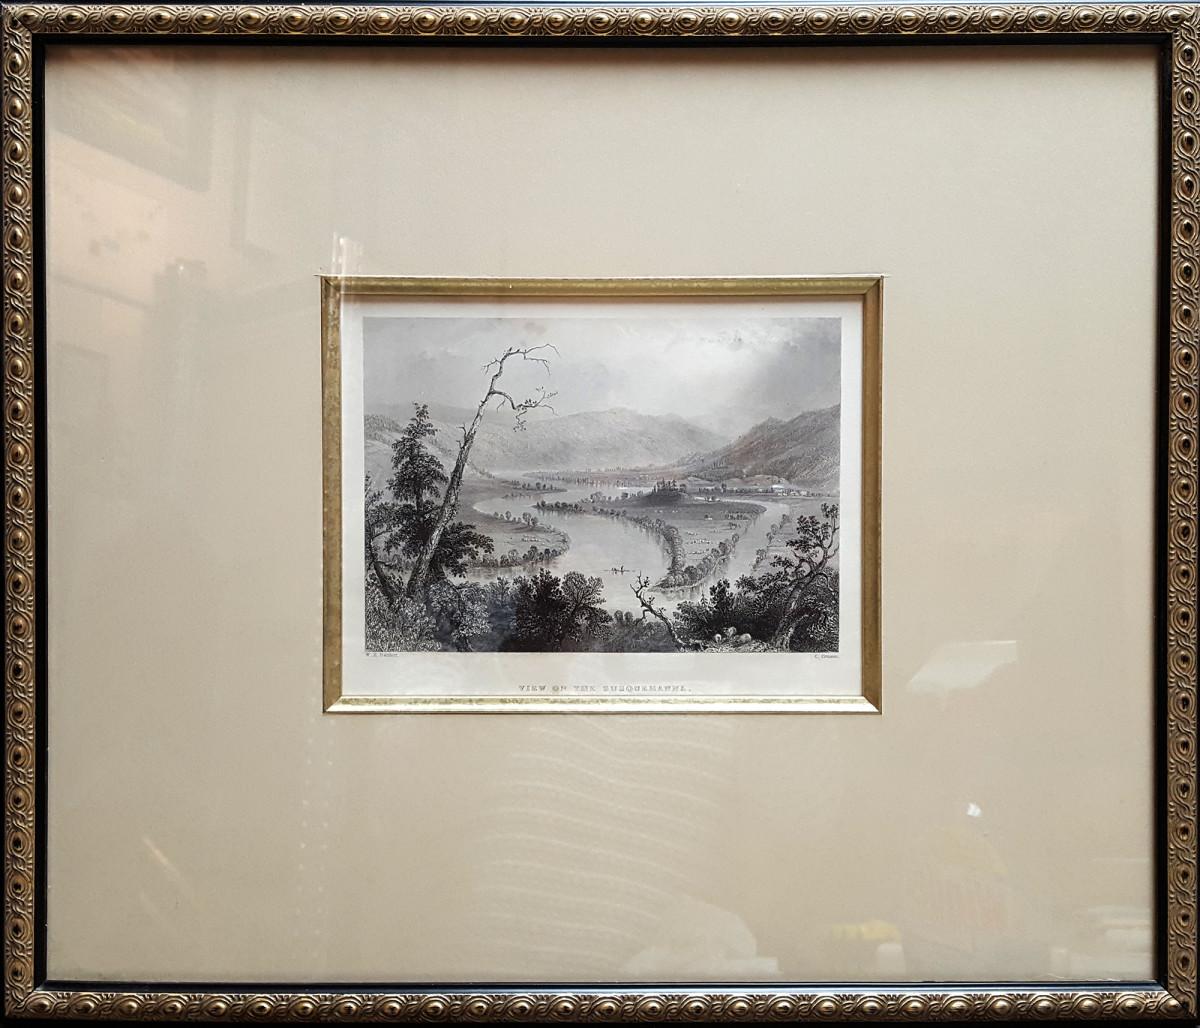 2953 - View on the Susquemanna by W.H. (William Henry) Bartlett (1809-1854)